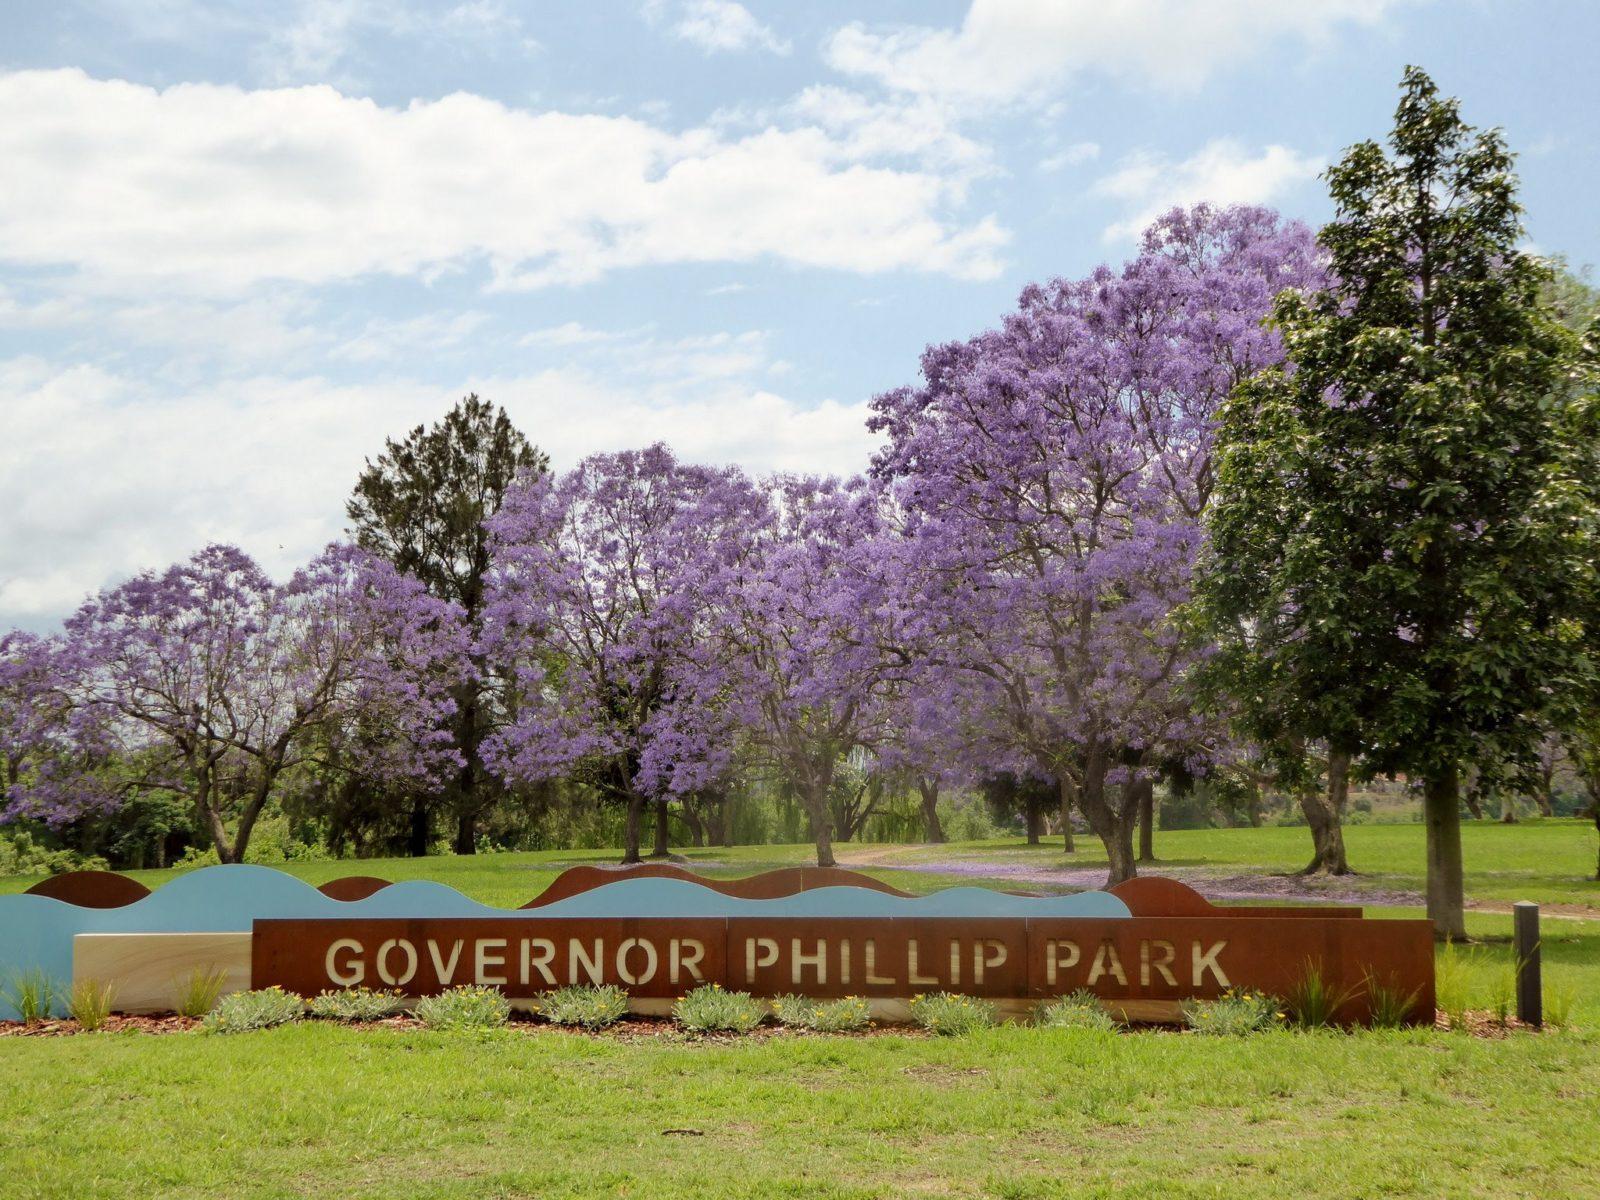 Governor Philip Park